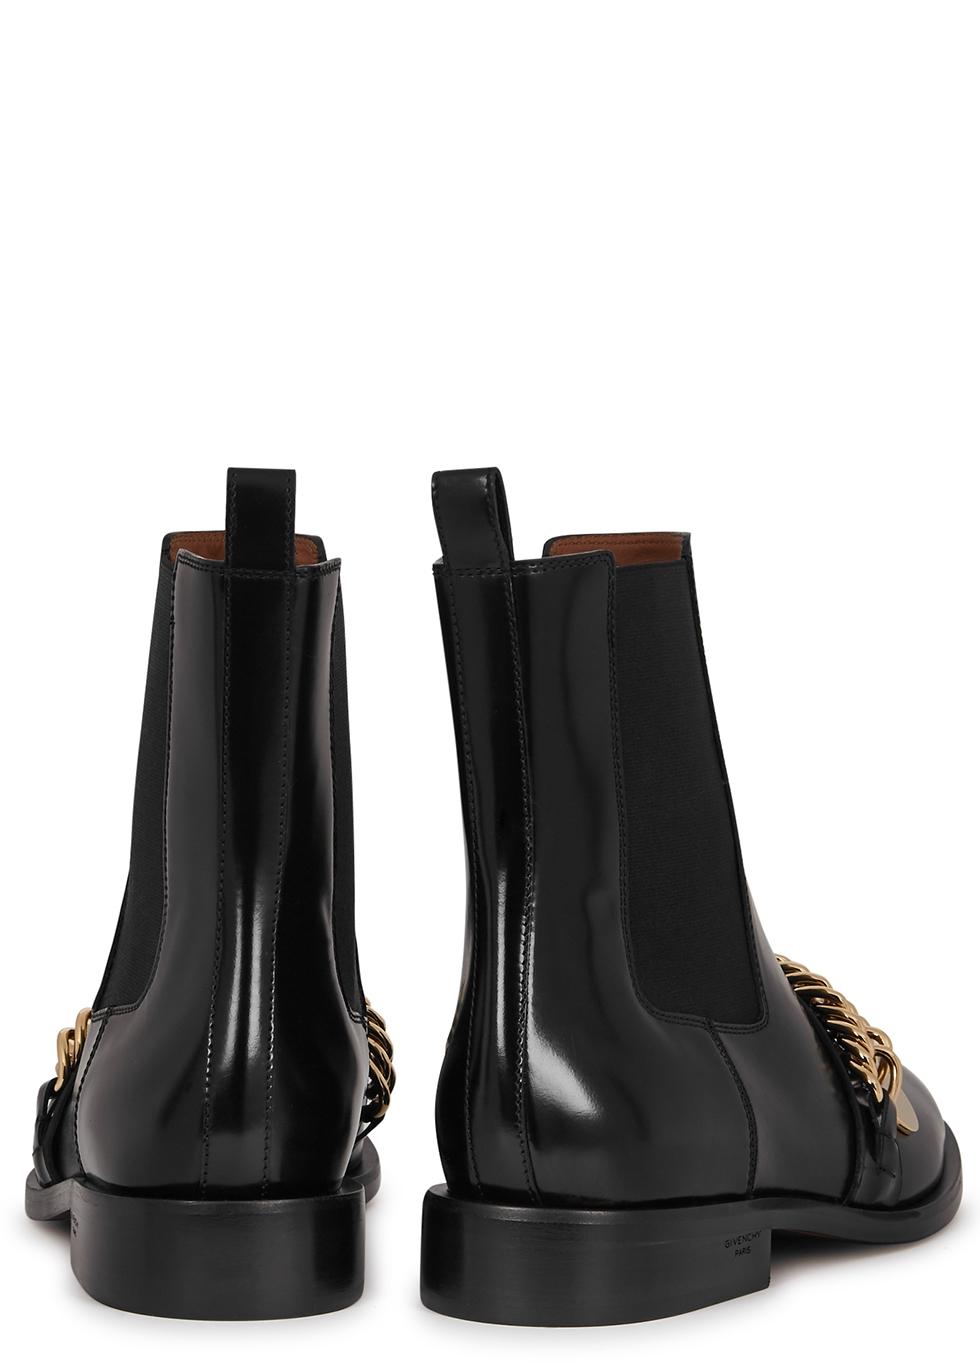 Givenchy Black embellished leather